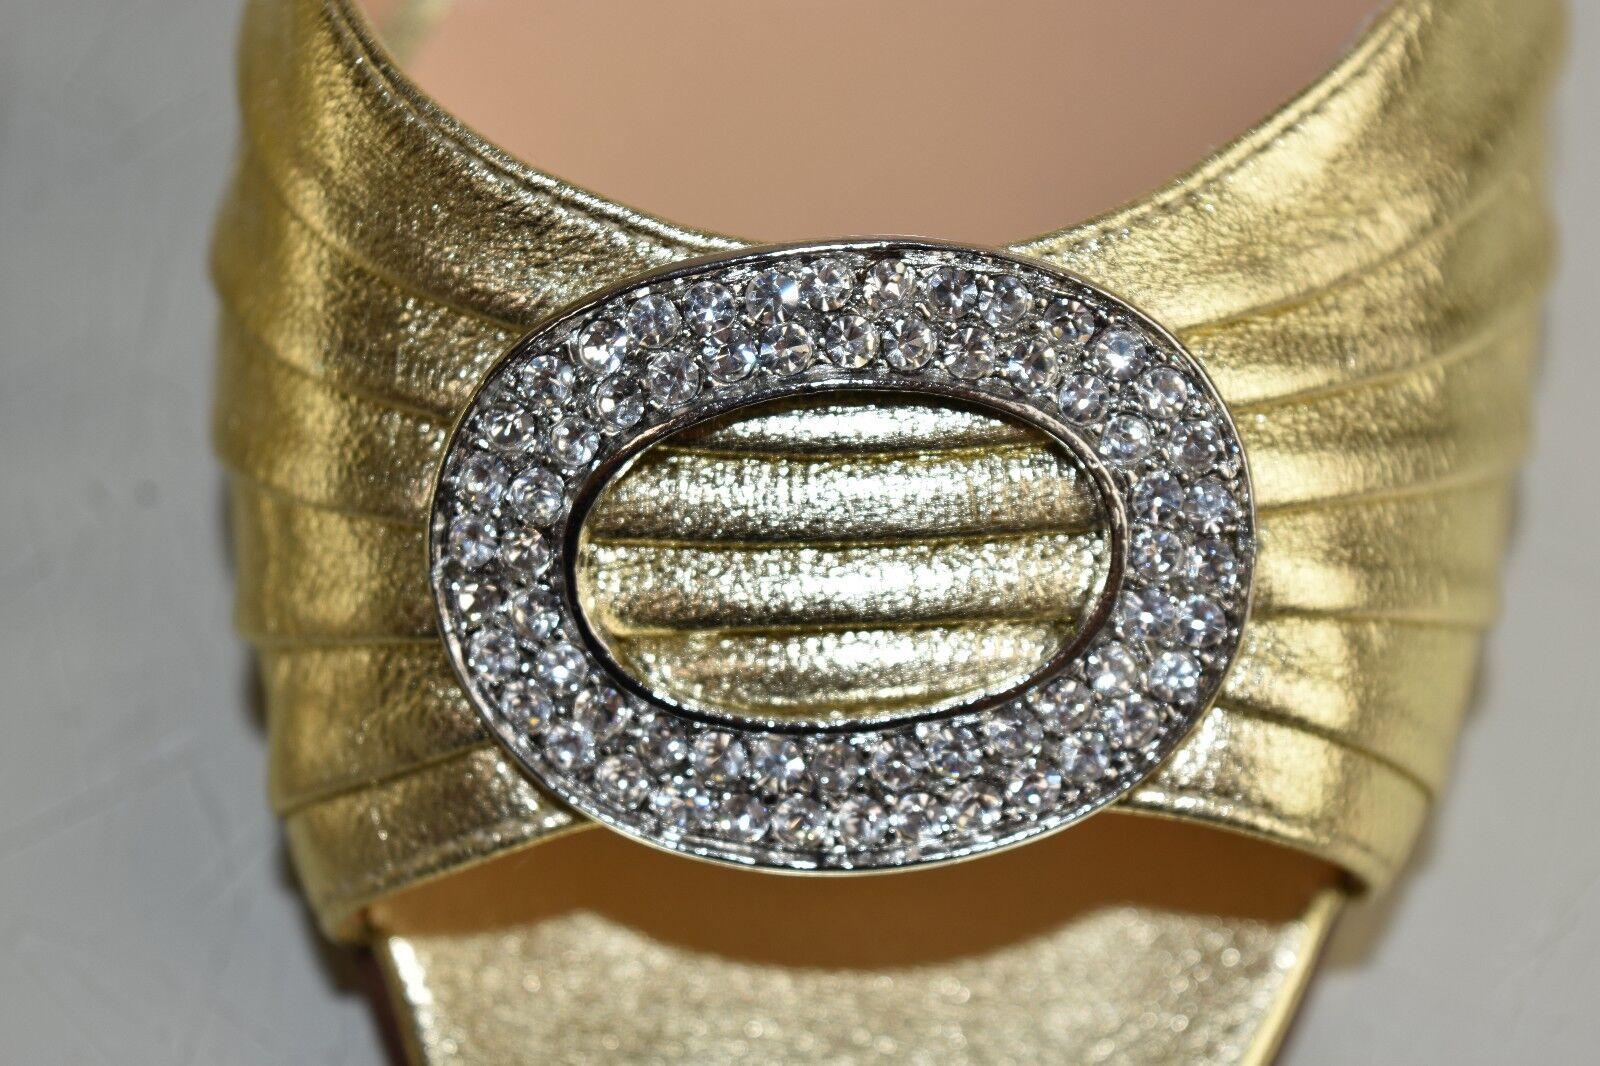 Neu Manolo Blahnik Sedaraby Gold Nappa Jeweled Jeweled Jeweled Dorsay Hochzeitsschuhe 41.5  102c84